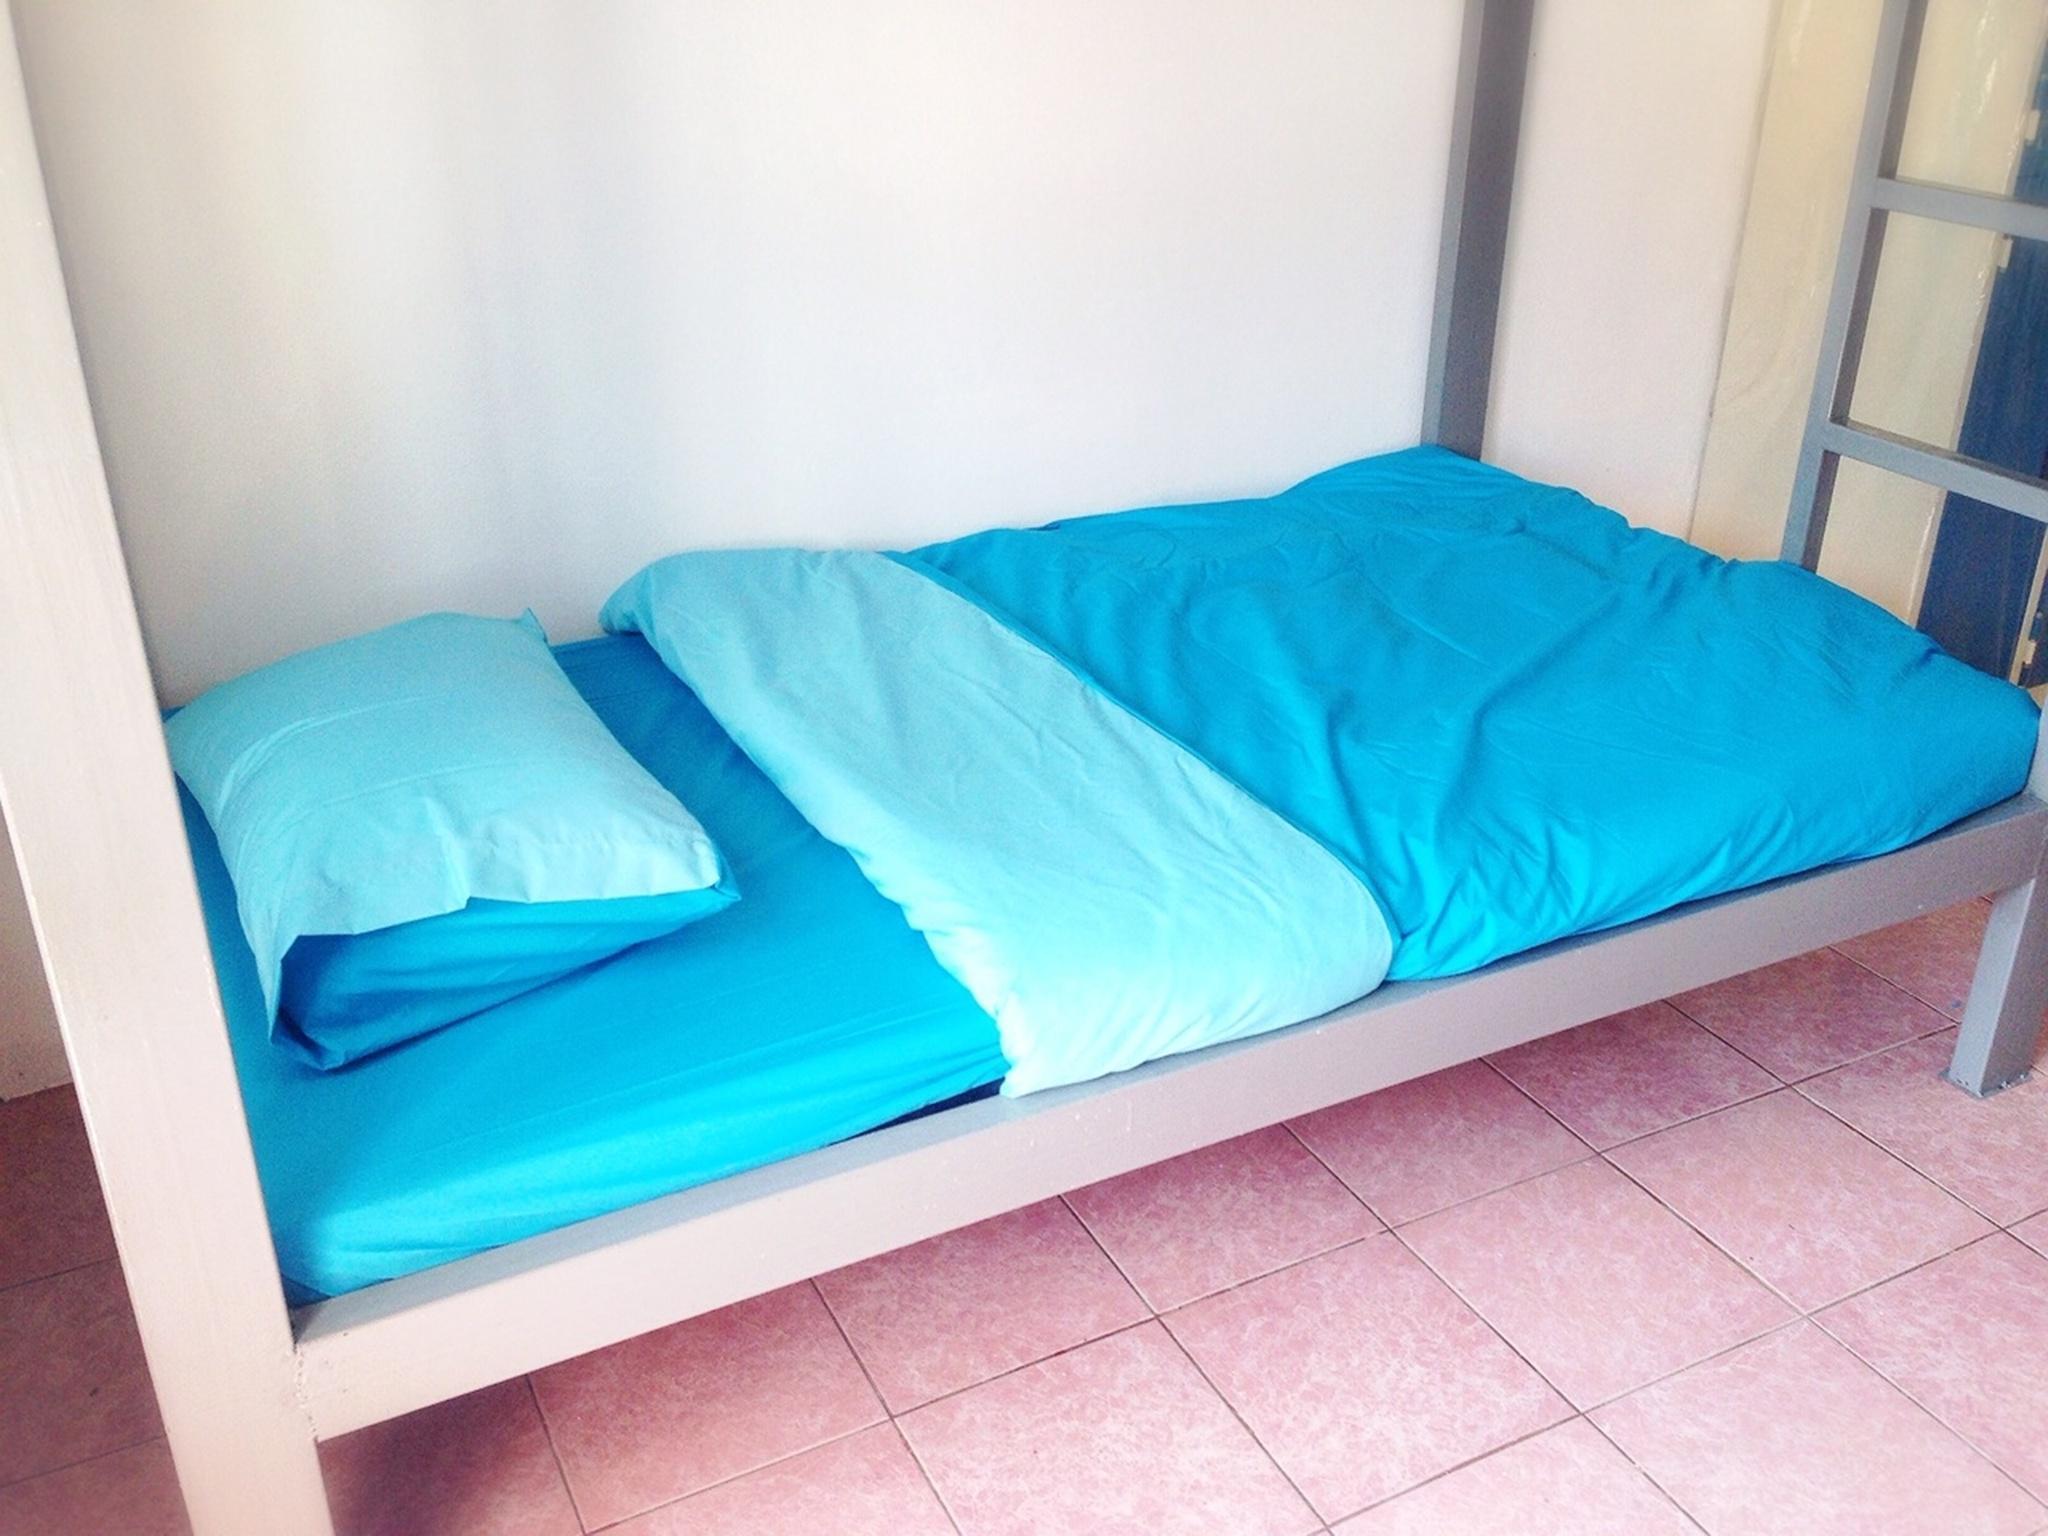 ISC Coffee and Bed Hostel,ไอเอสซี คอฟฟี่ แอนด์ เบด โฮสเทล